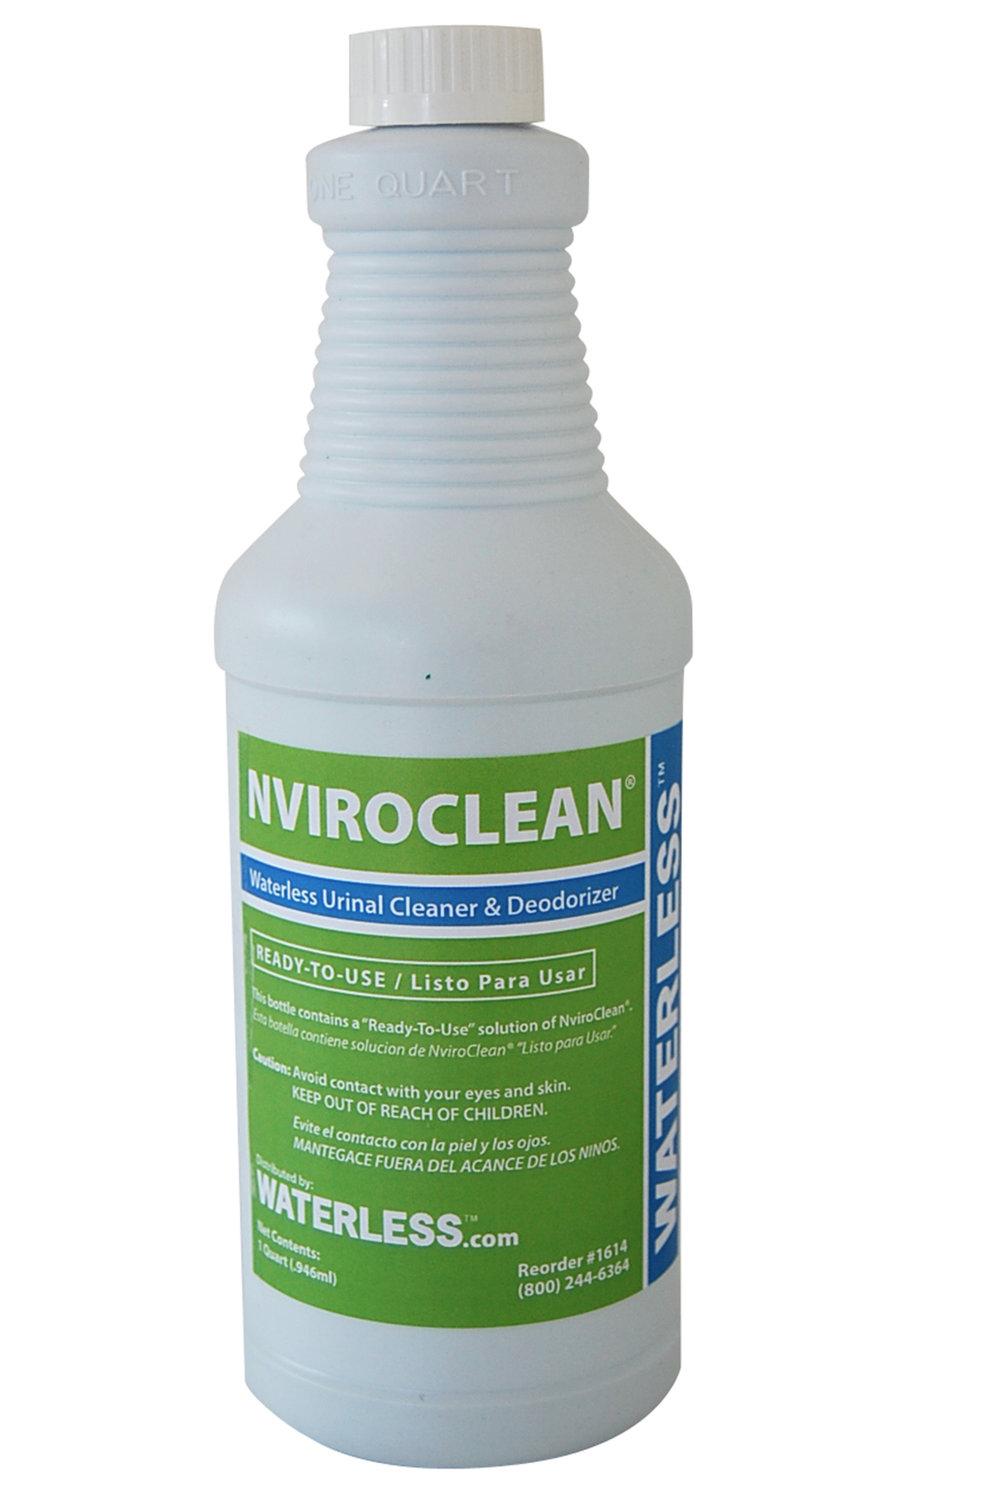 waterless+urinal+cleaner